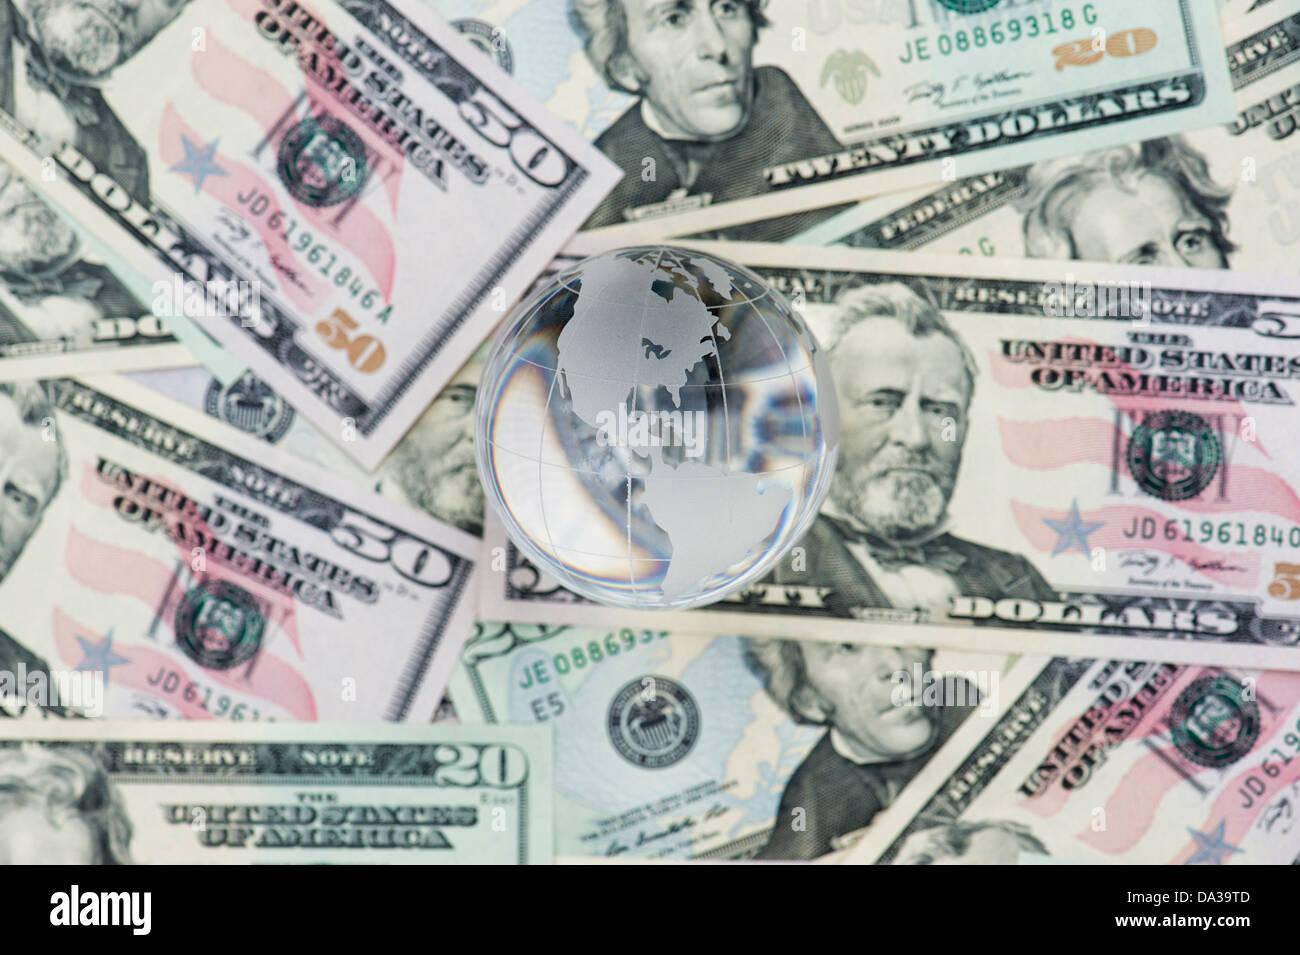 Glass Globe showing America on American dollar bills - Stock Image